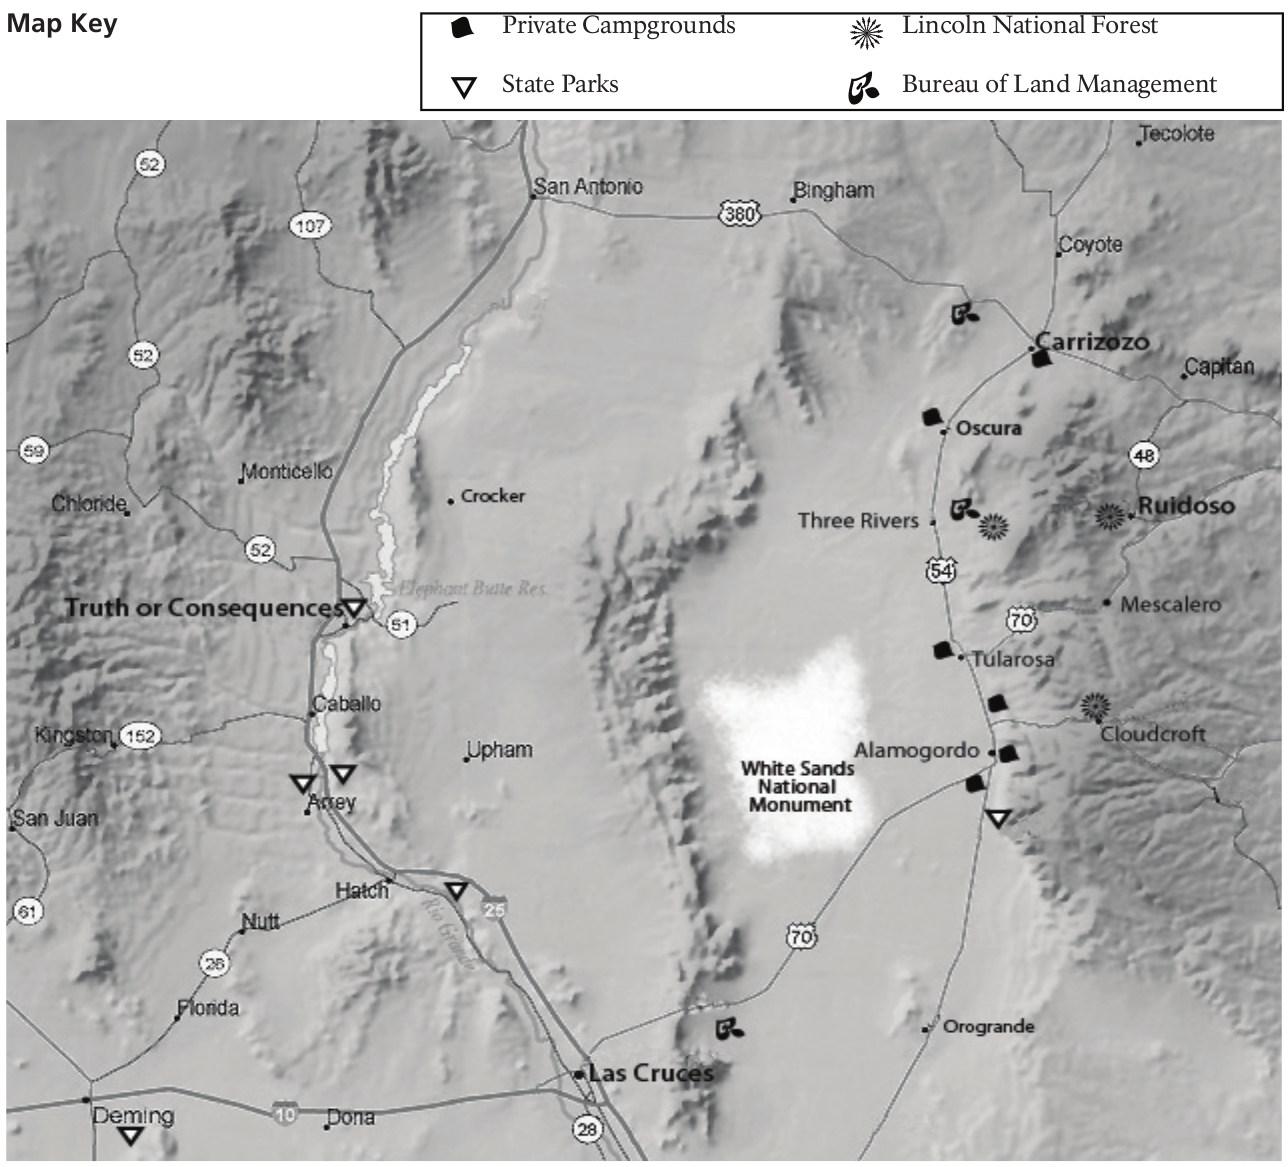 FileNPS Whitesandsareacampingmapjpg Wikimedia Commons - Us national monuments map